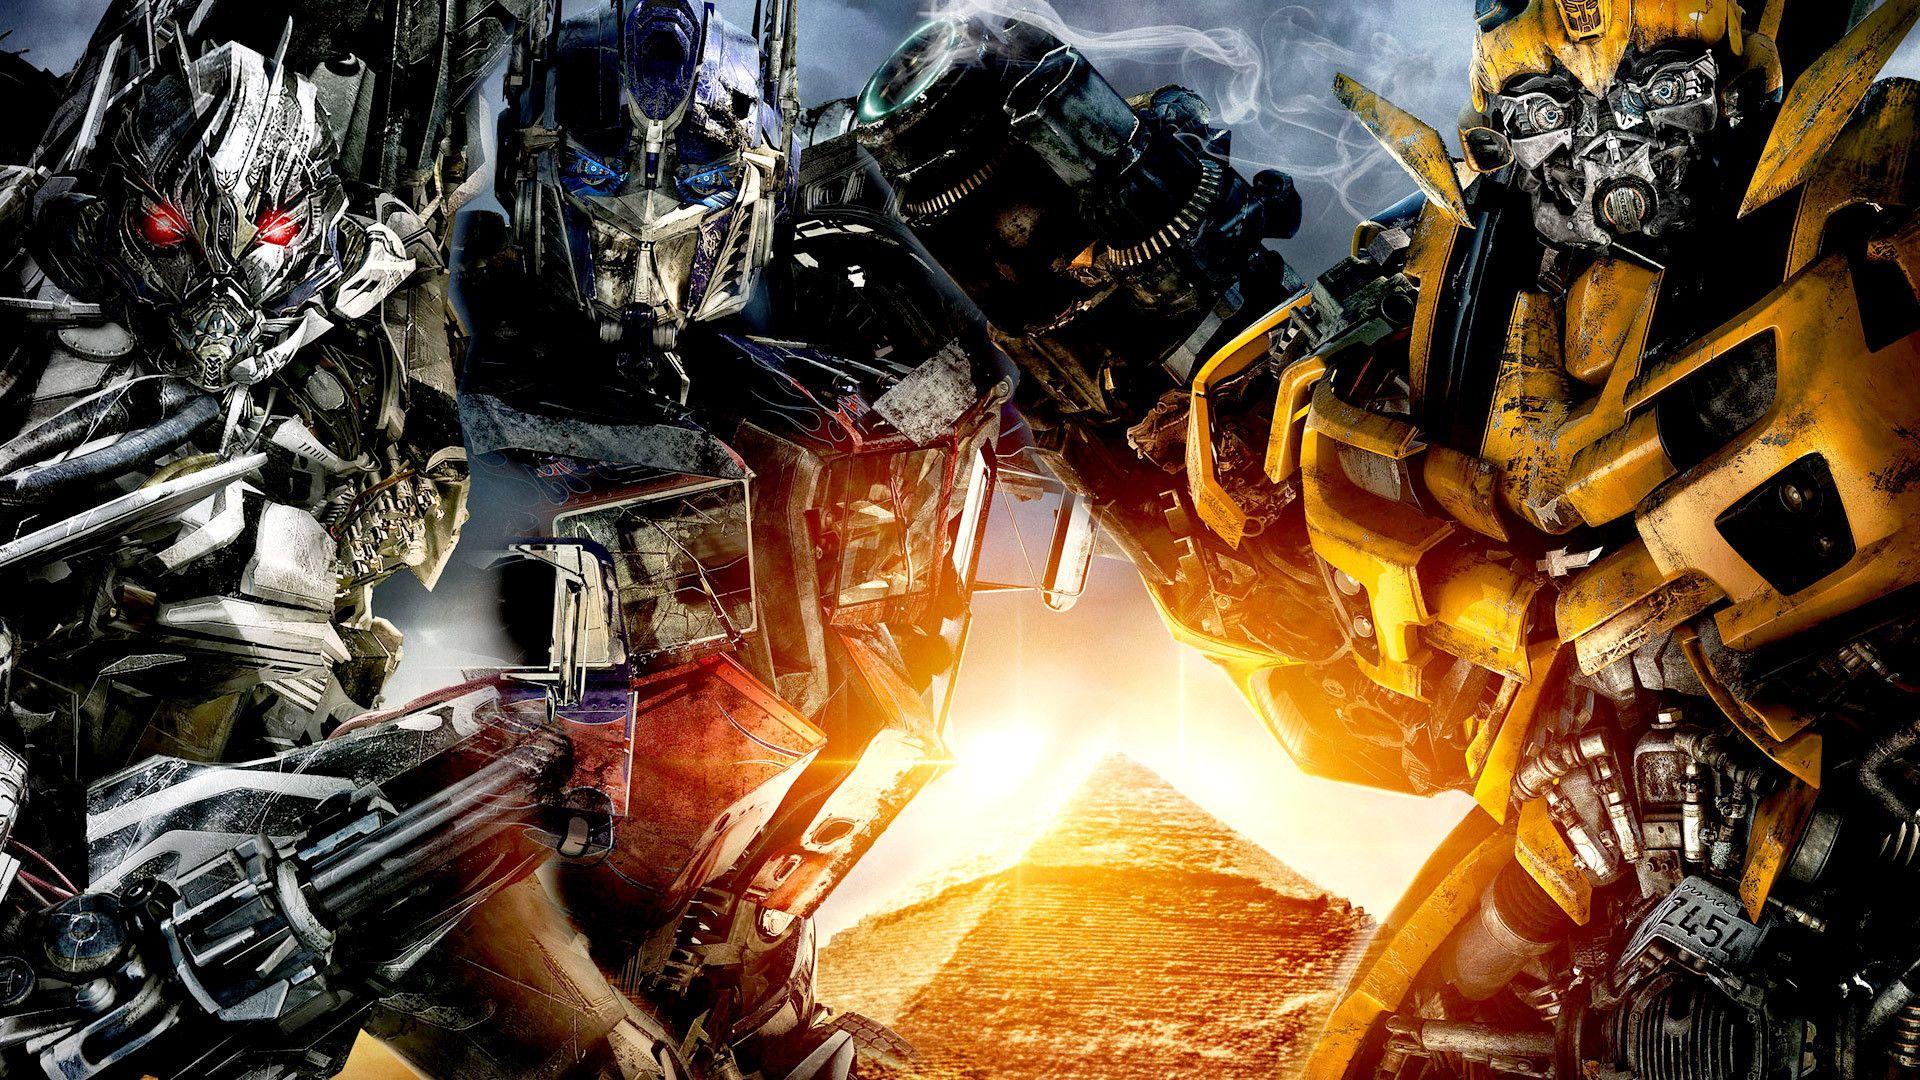 Bumble Bee Optimus Prime Transformers Wallpaper HD